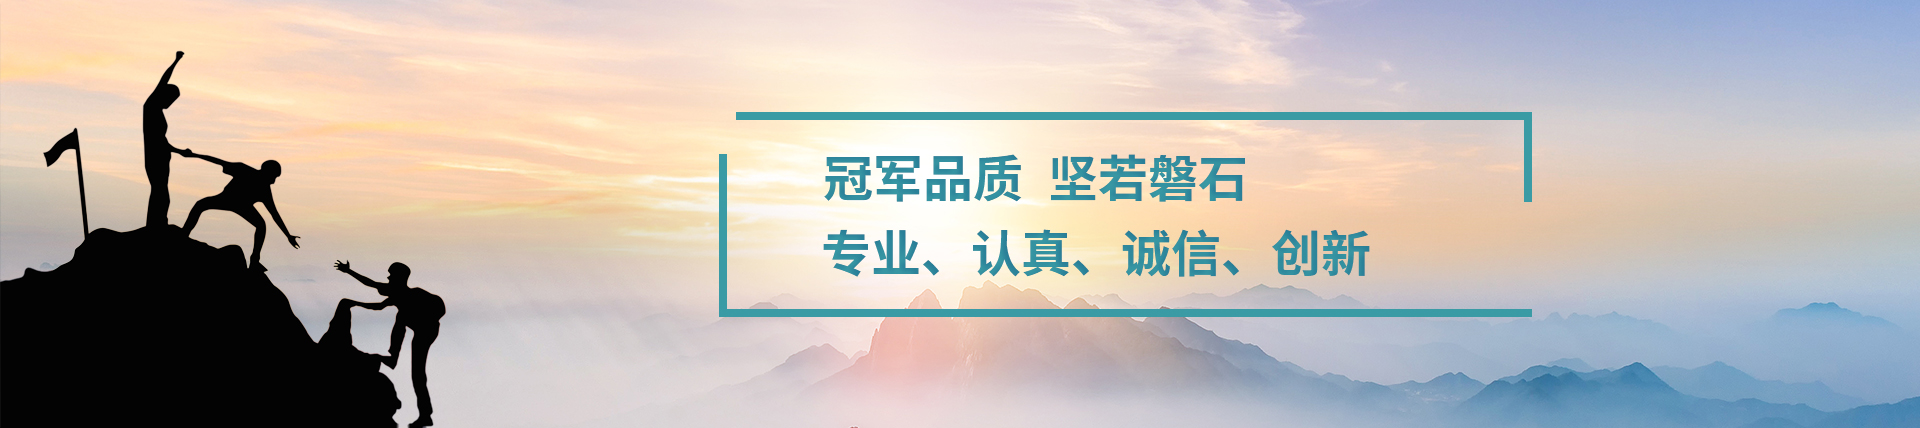 http://www.cqguanjian.com/data/upload/202105/20210525105853_302.jpg